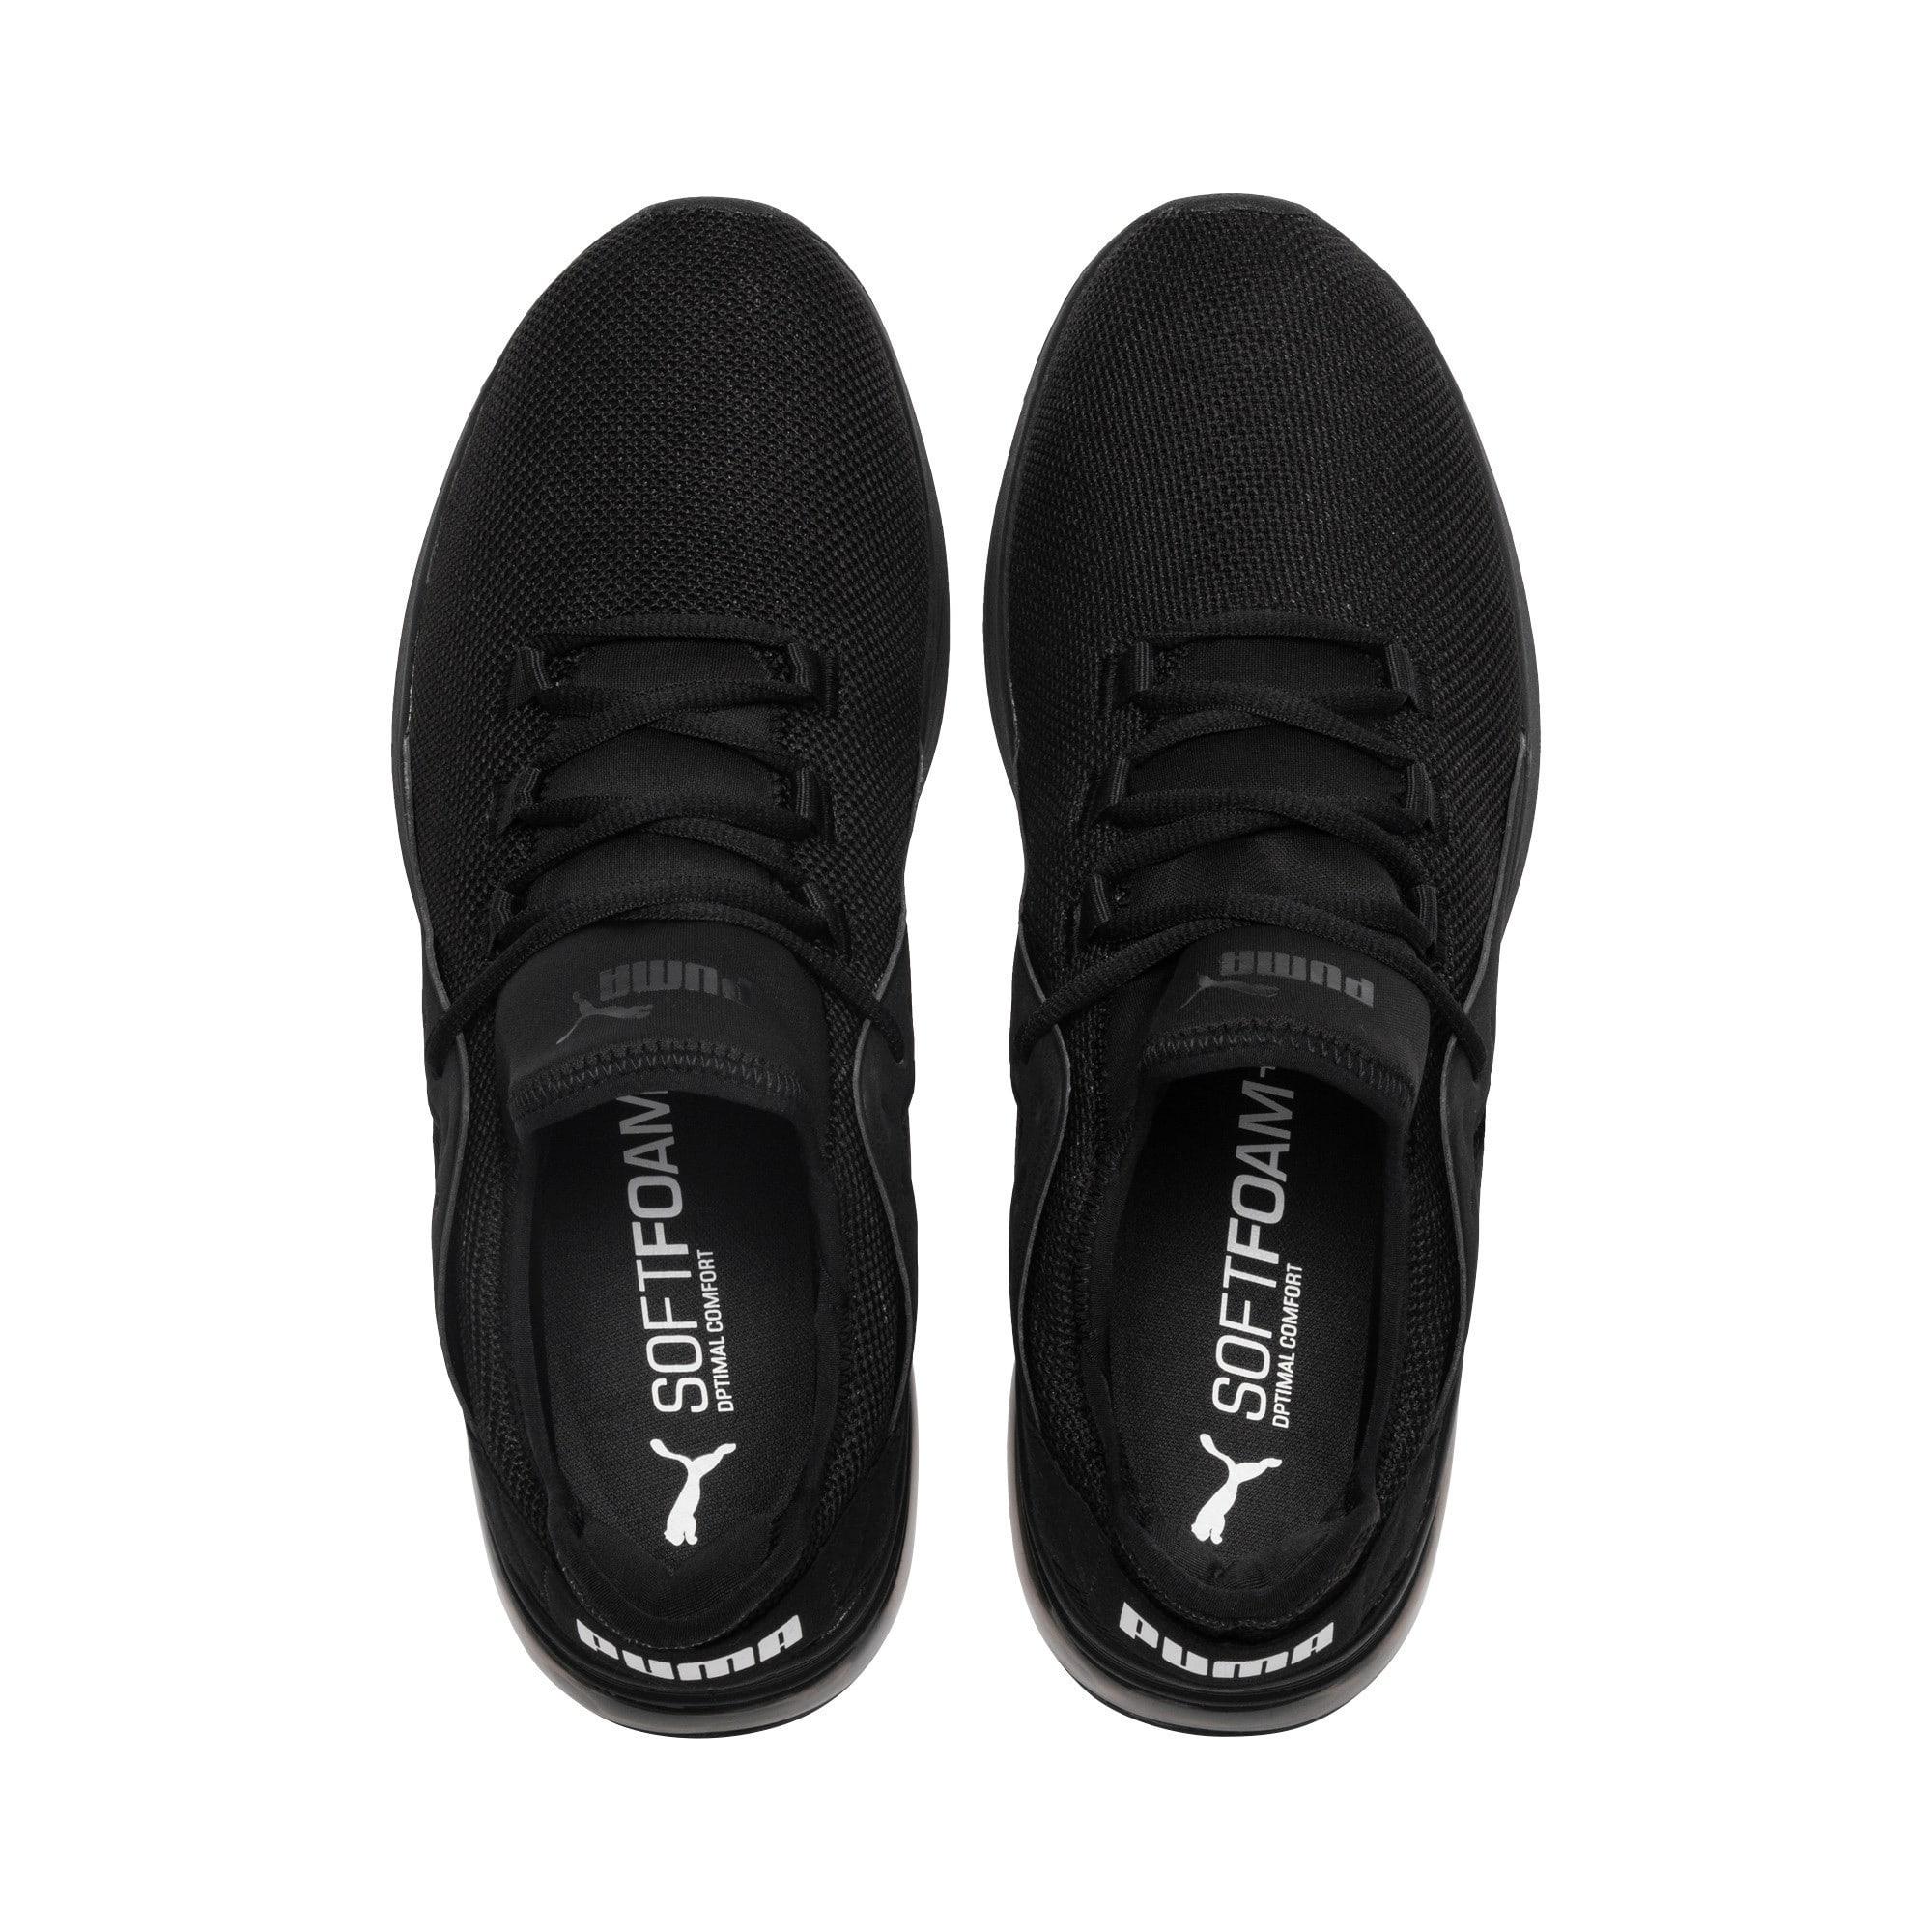 Thumbnail 6 of Electron Street Sneakers, Puma Black-Puma Black-Black, medium